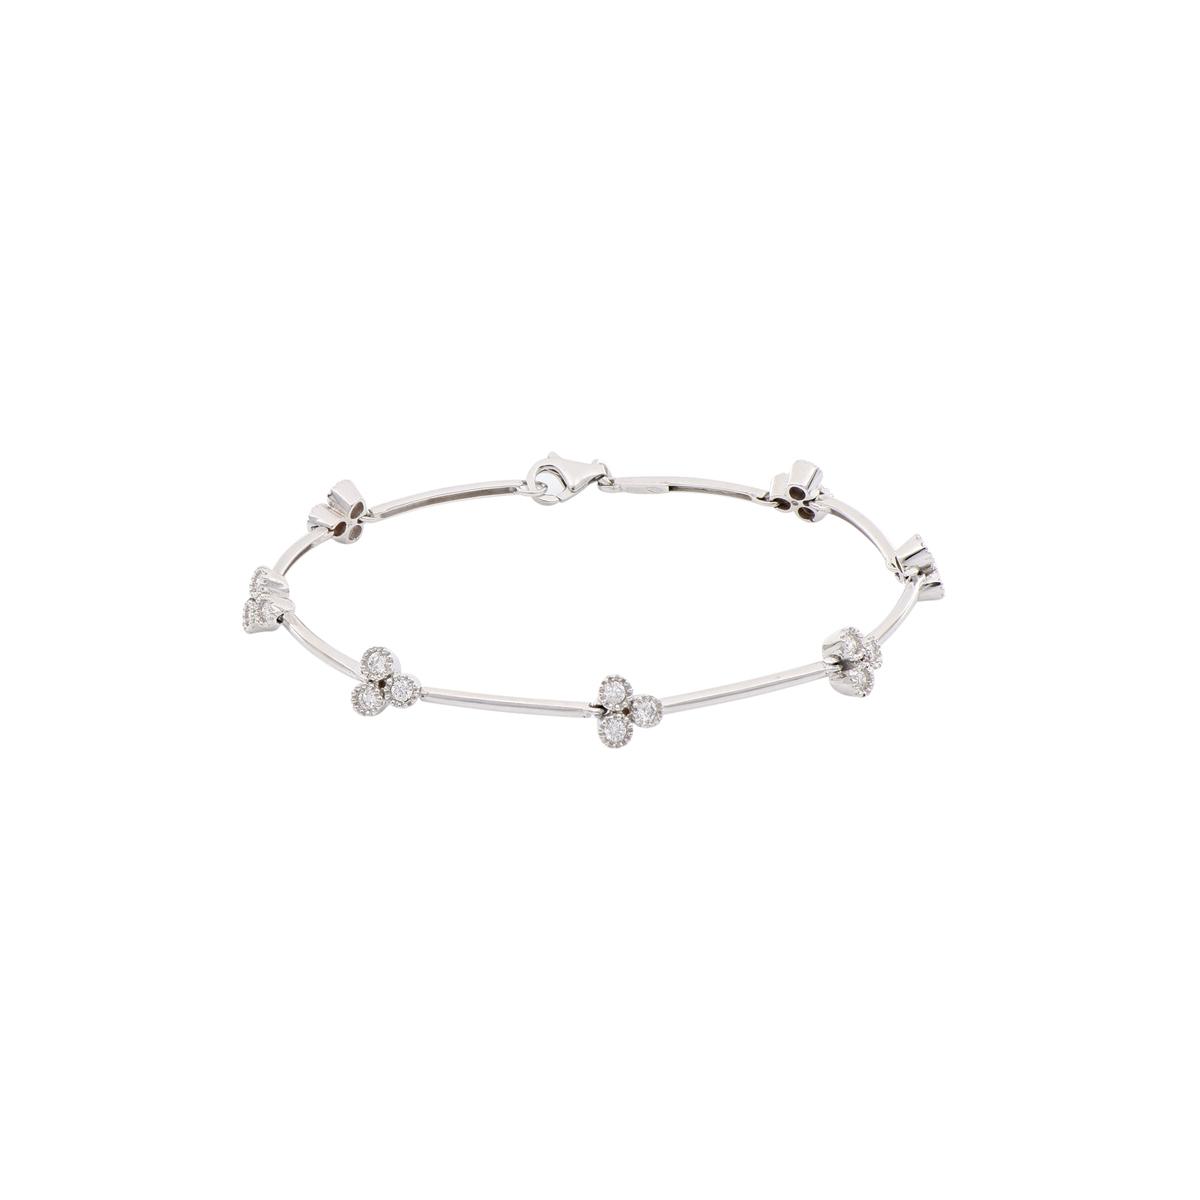 White Gold Bar Link Bracelet with Diamonds